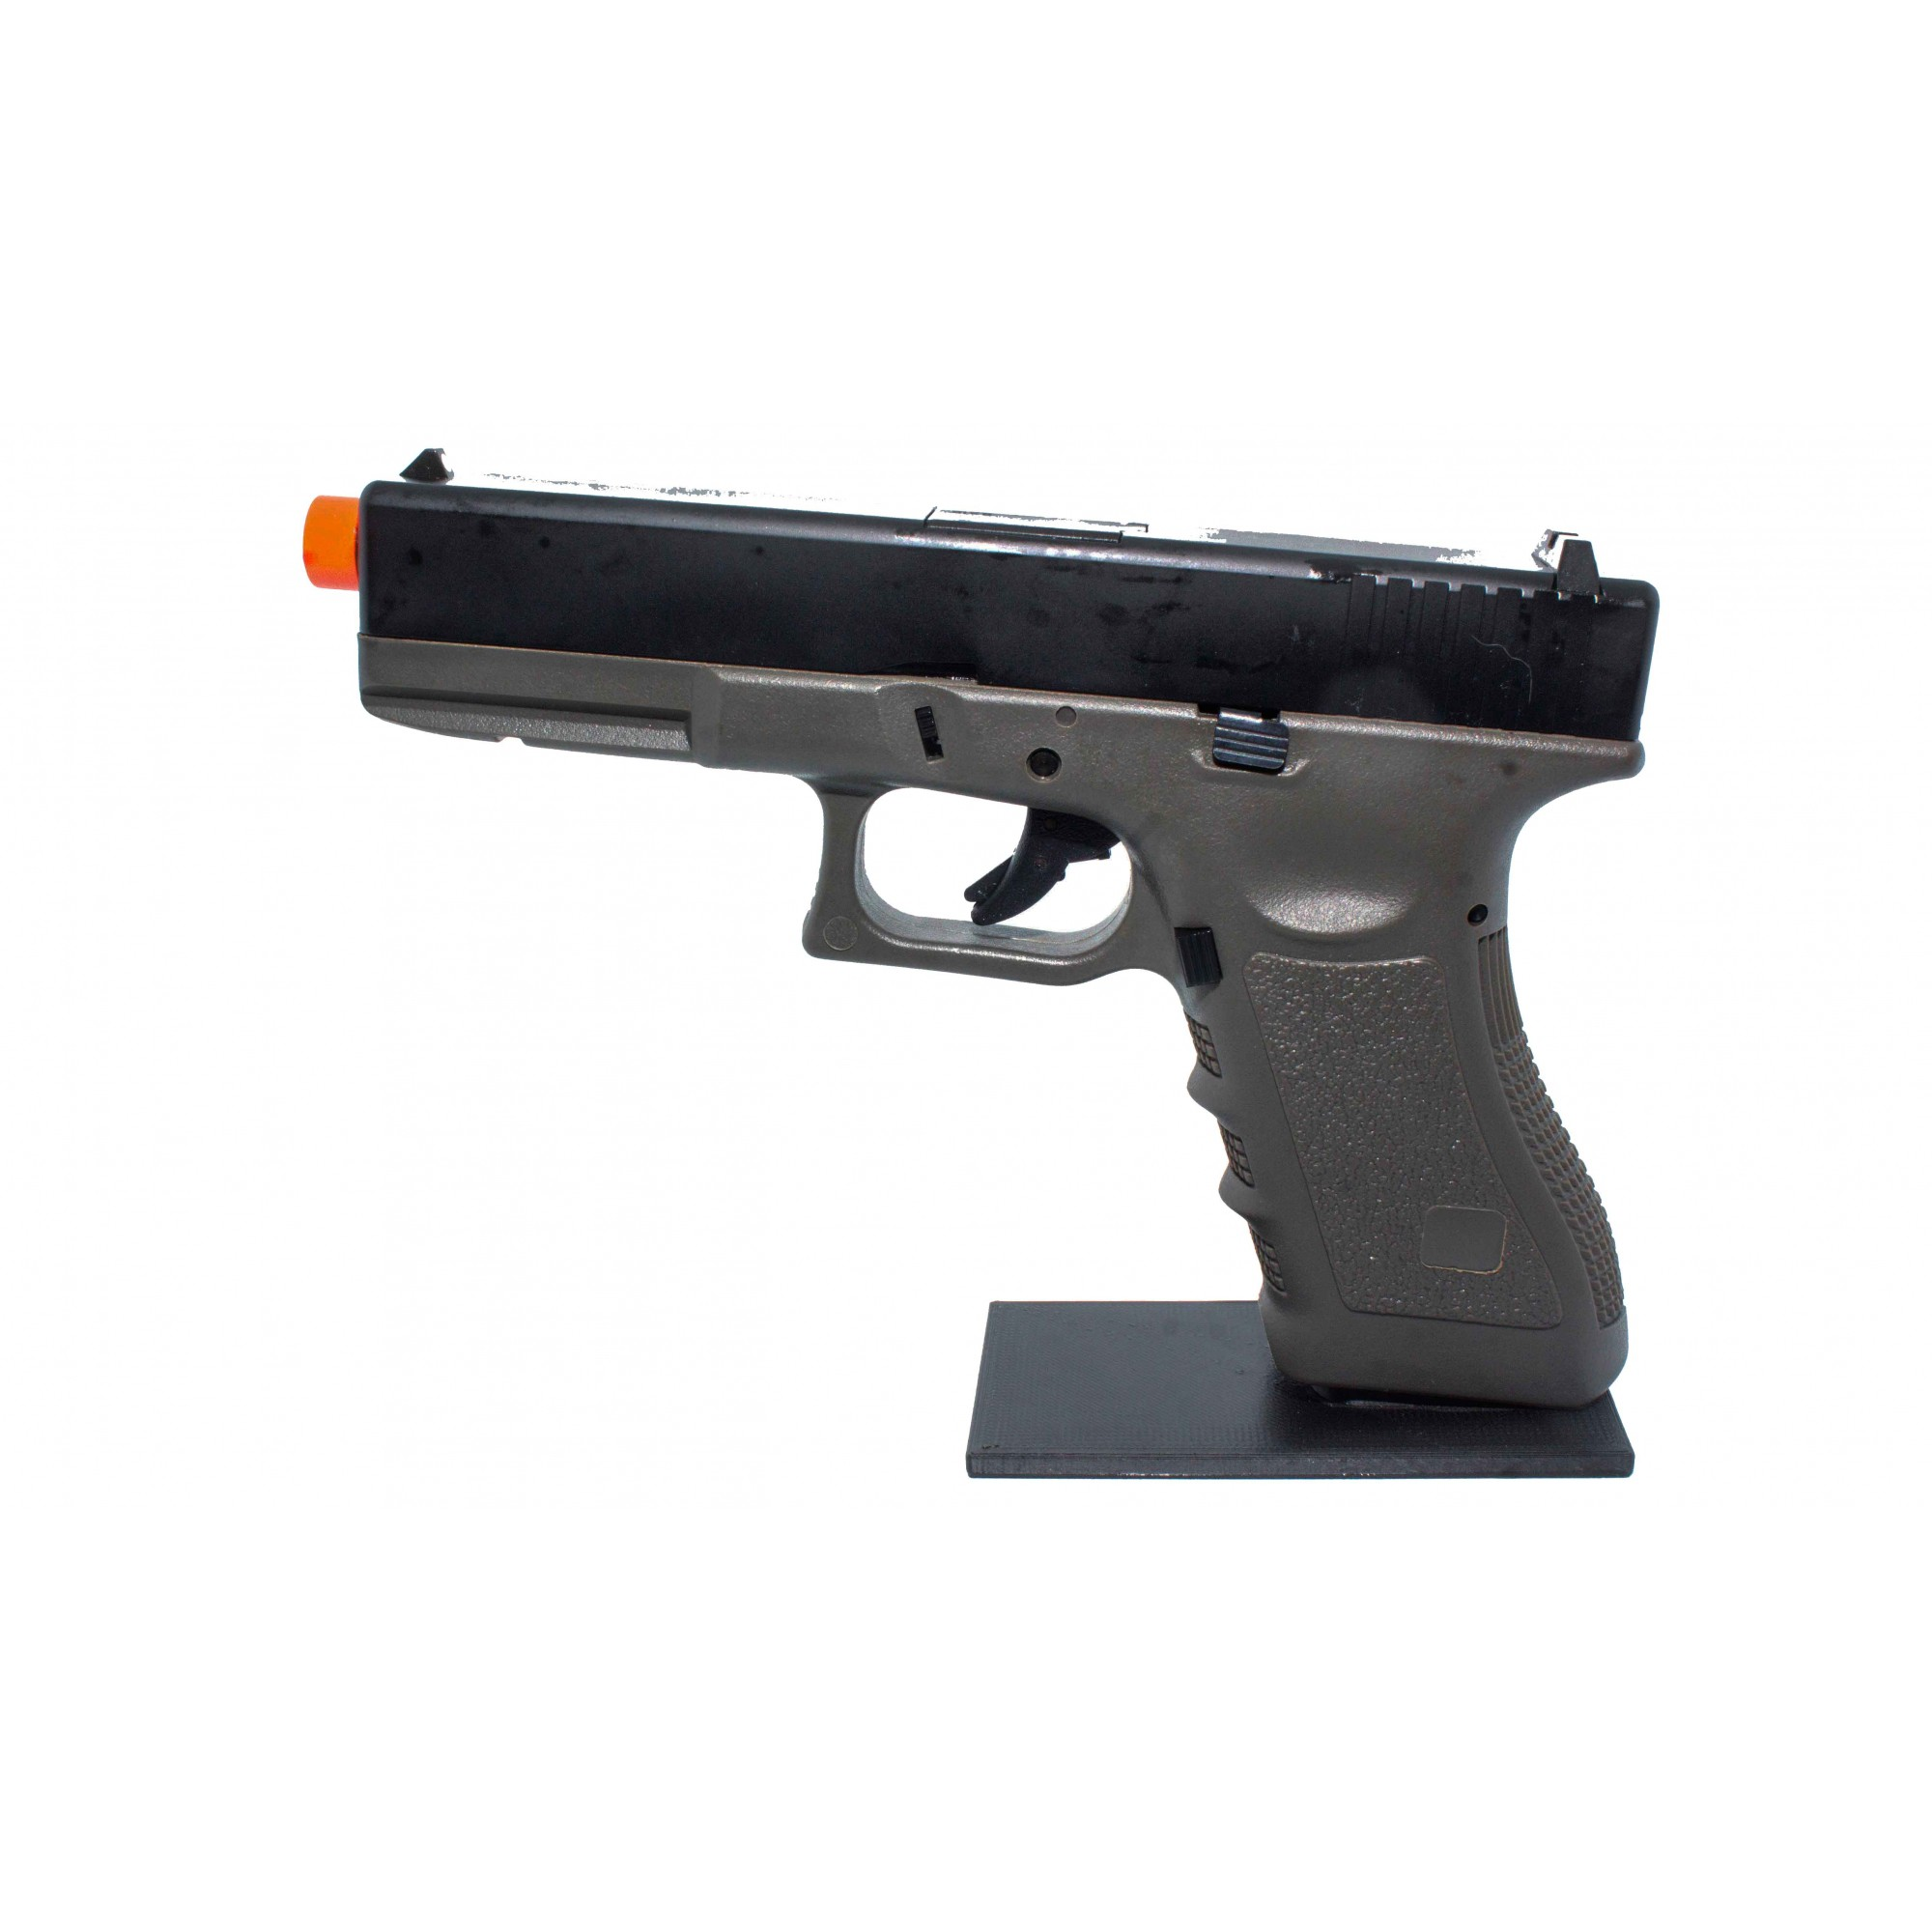 Pistola Airsoft GBB R17 OD Blowback 6mm